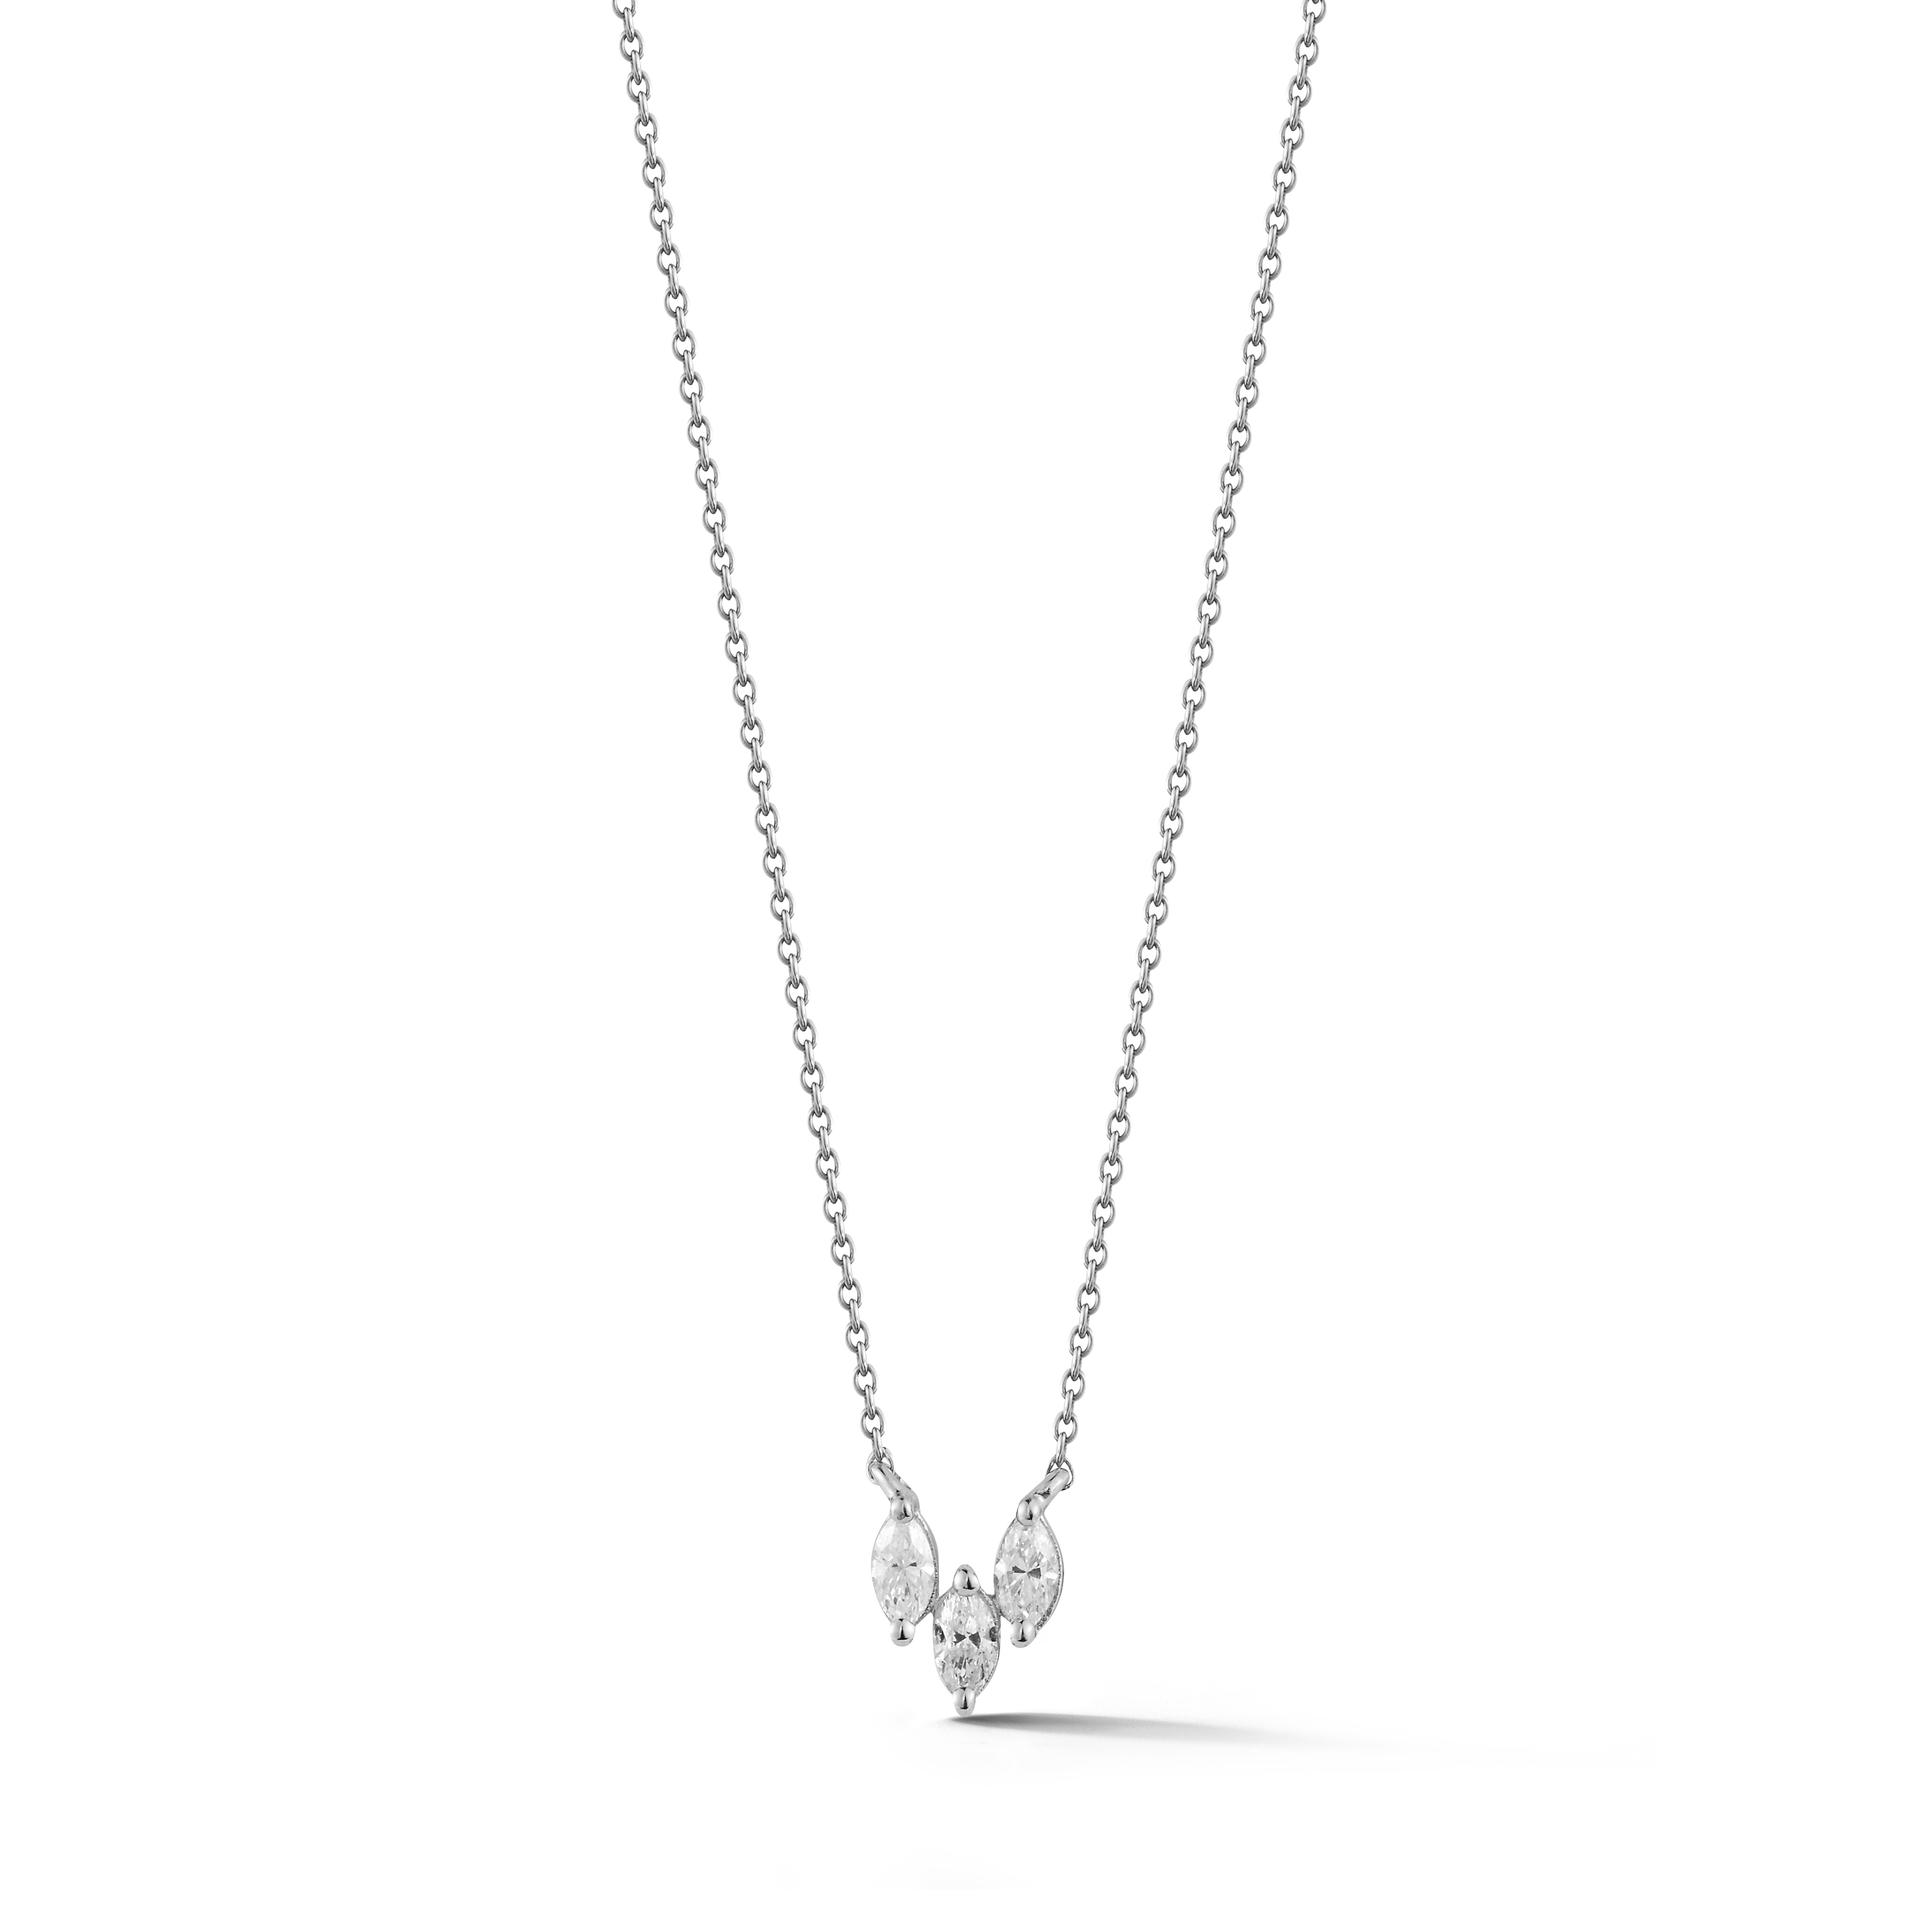 14 karat white gold & diamond necklace